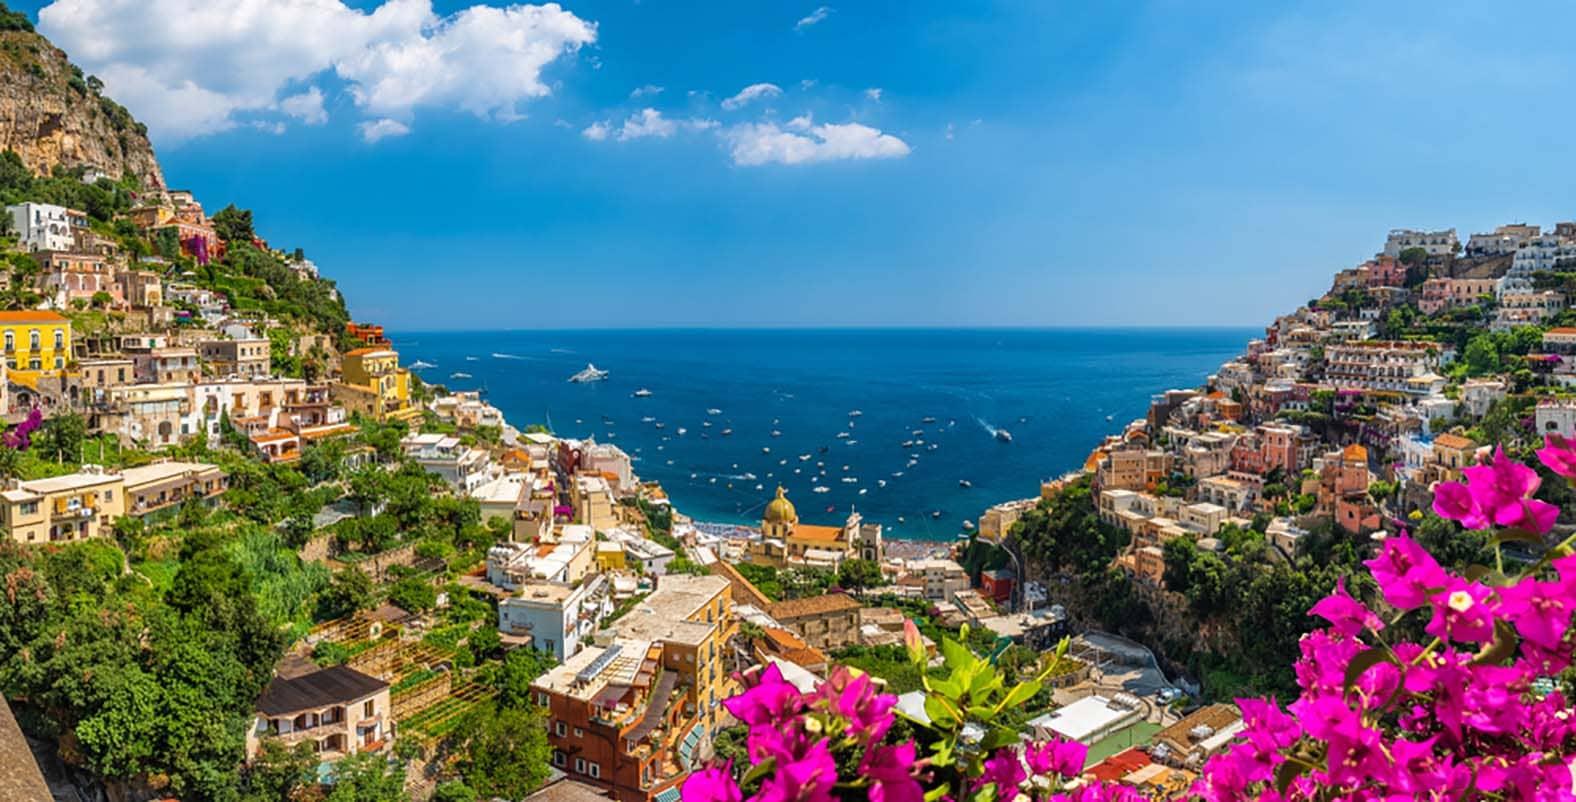 20210516100335Costiera-Amalfitana.jpg